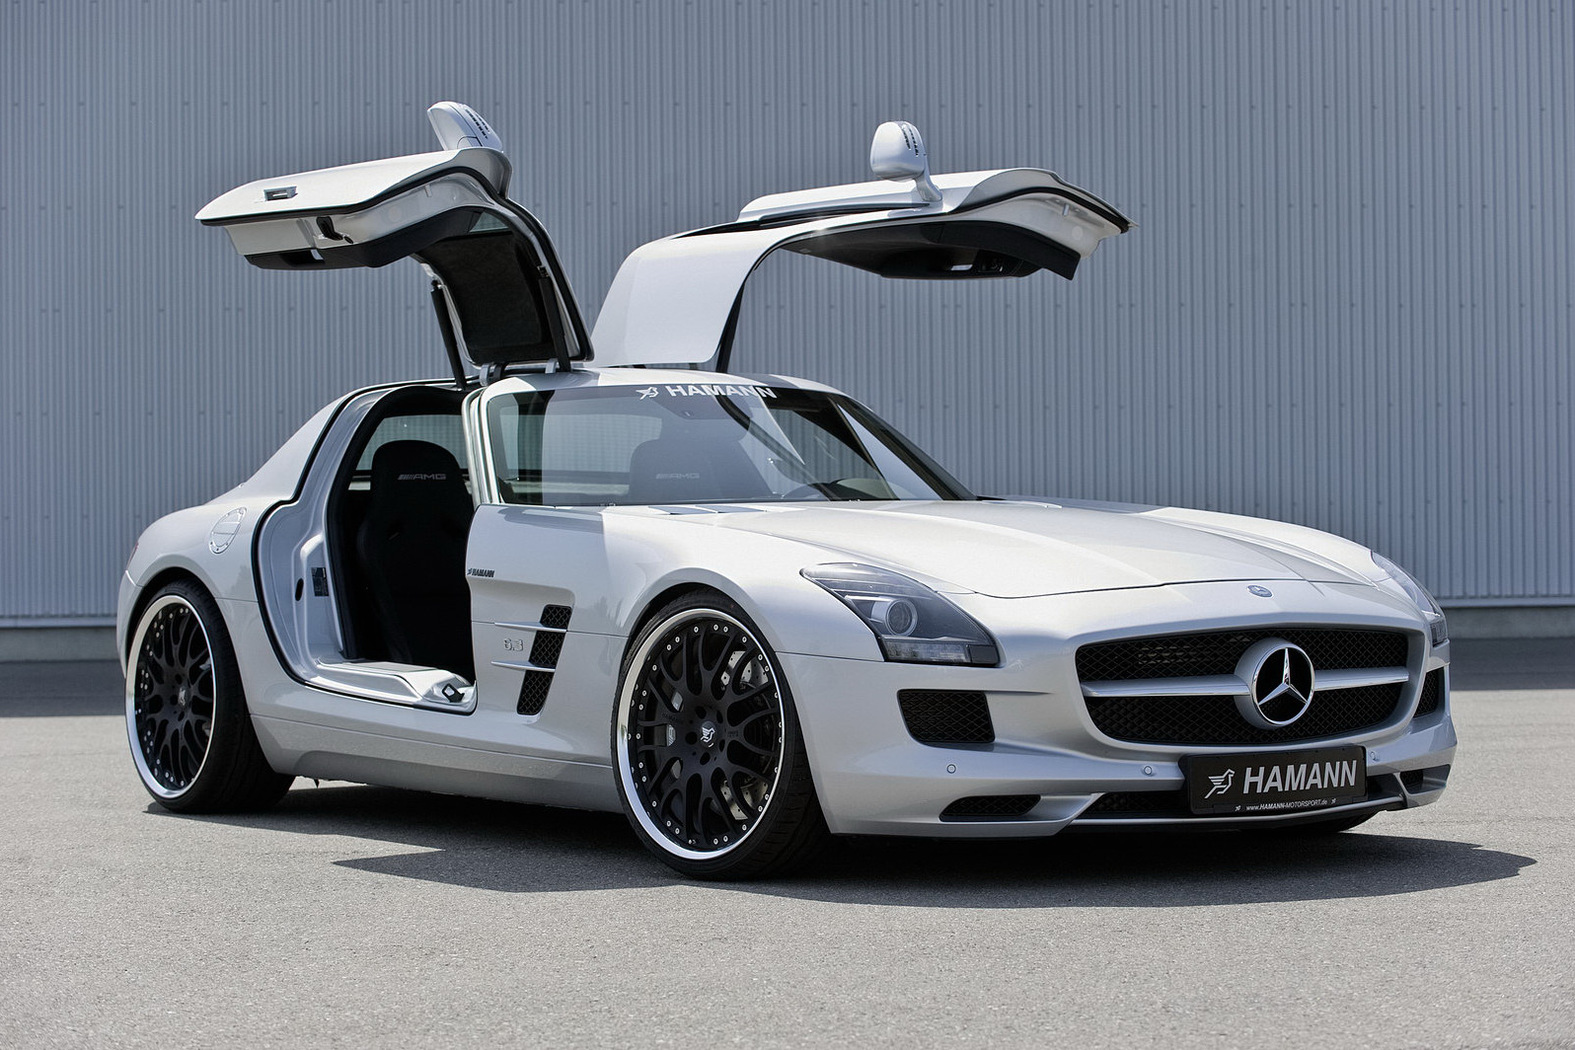 http://1.bp.blogspot.com/-IbUsOXhf0ys/TrEjjDQMg3I/AAAAAAAAFhY/hxiGLcS_Th8/s1600/Mercedes+SLS+AMG+3.jpg